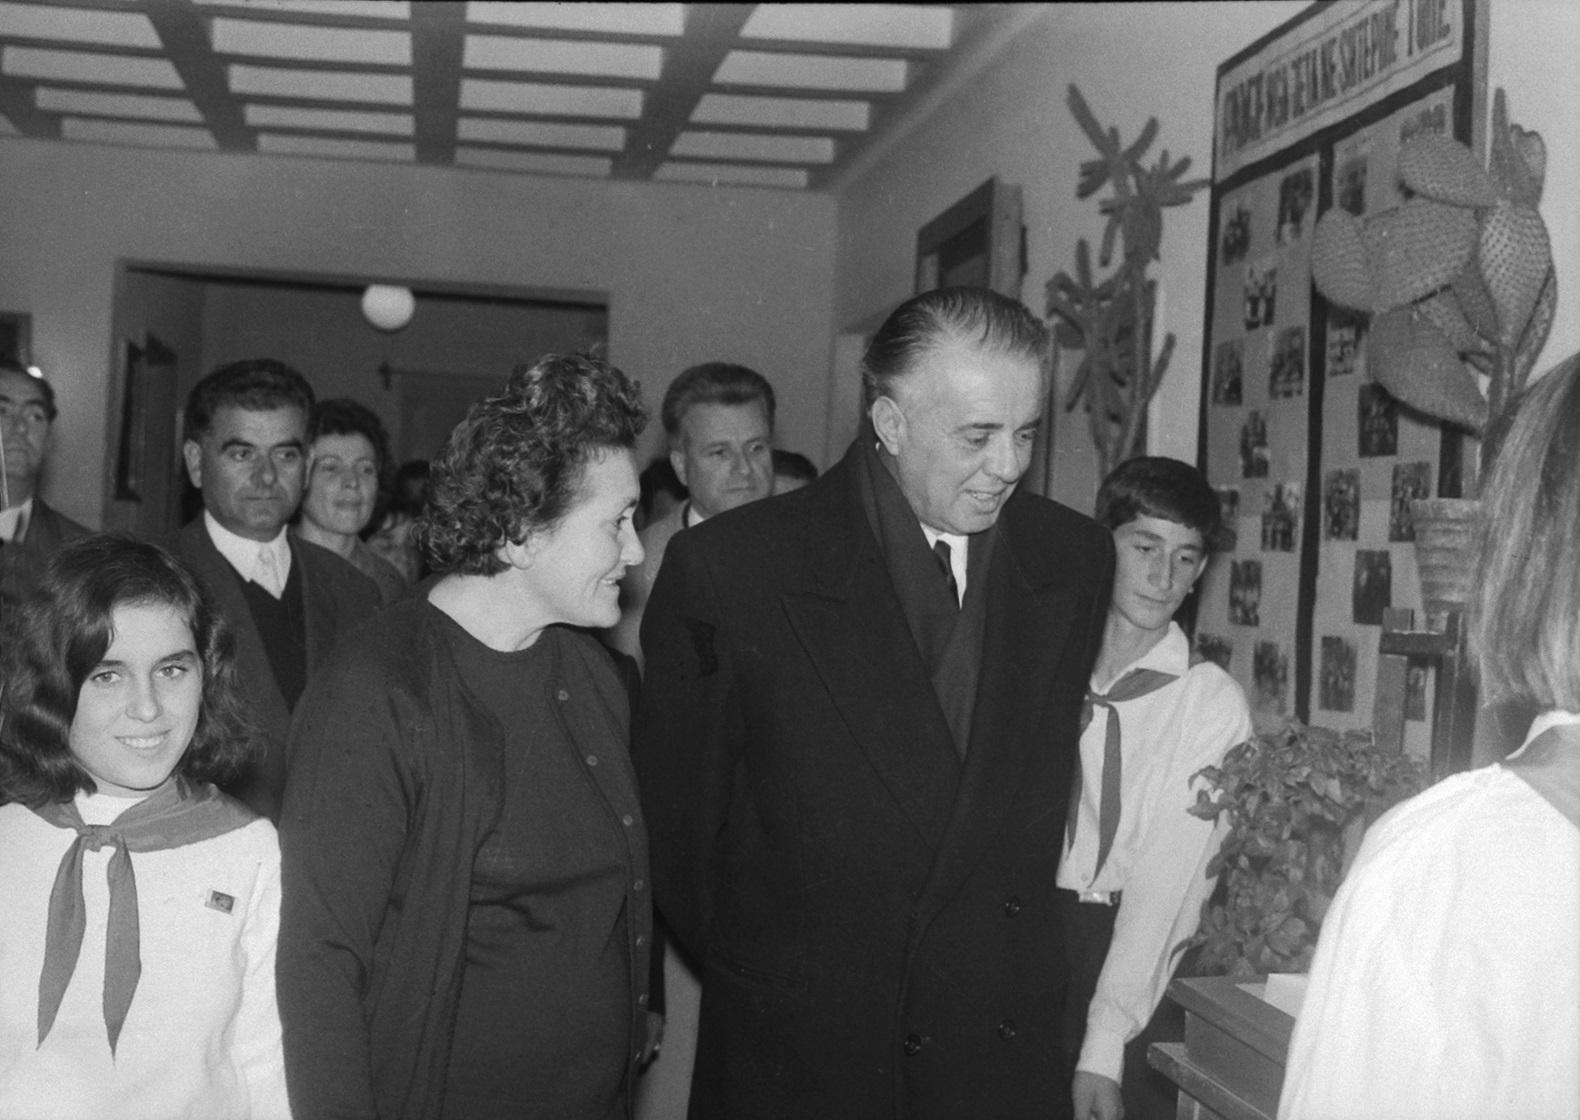 "VIZITA E UDHEHEQESIT KOMUNIST ENVER HOXHA NE SHTEPINE E FEMIJES ""8 NENTORI"" NE TIRANE, ME 23 NENTOR 1969, NR. 2"